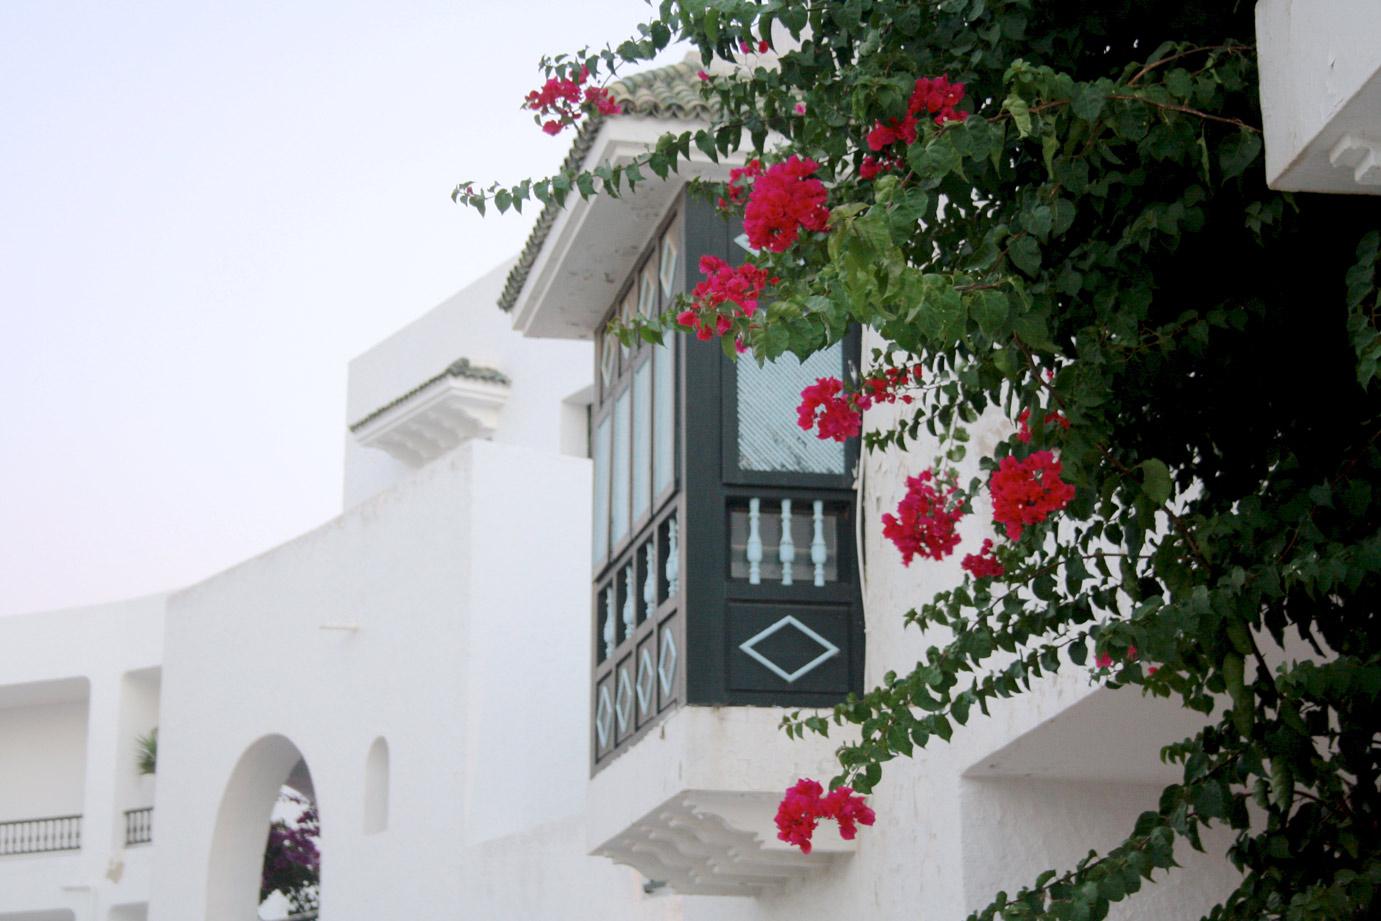 TUNISIA PHOTO DIARY III. 9